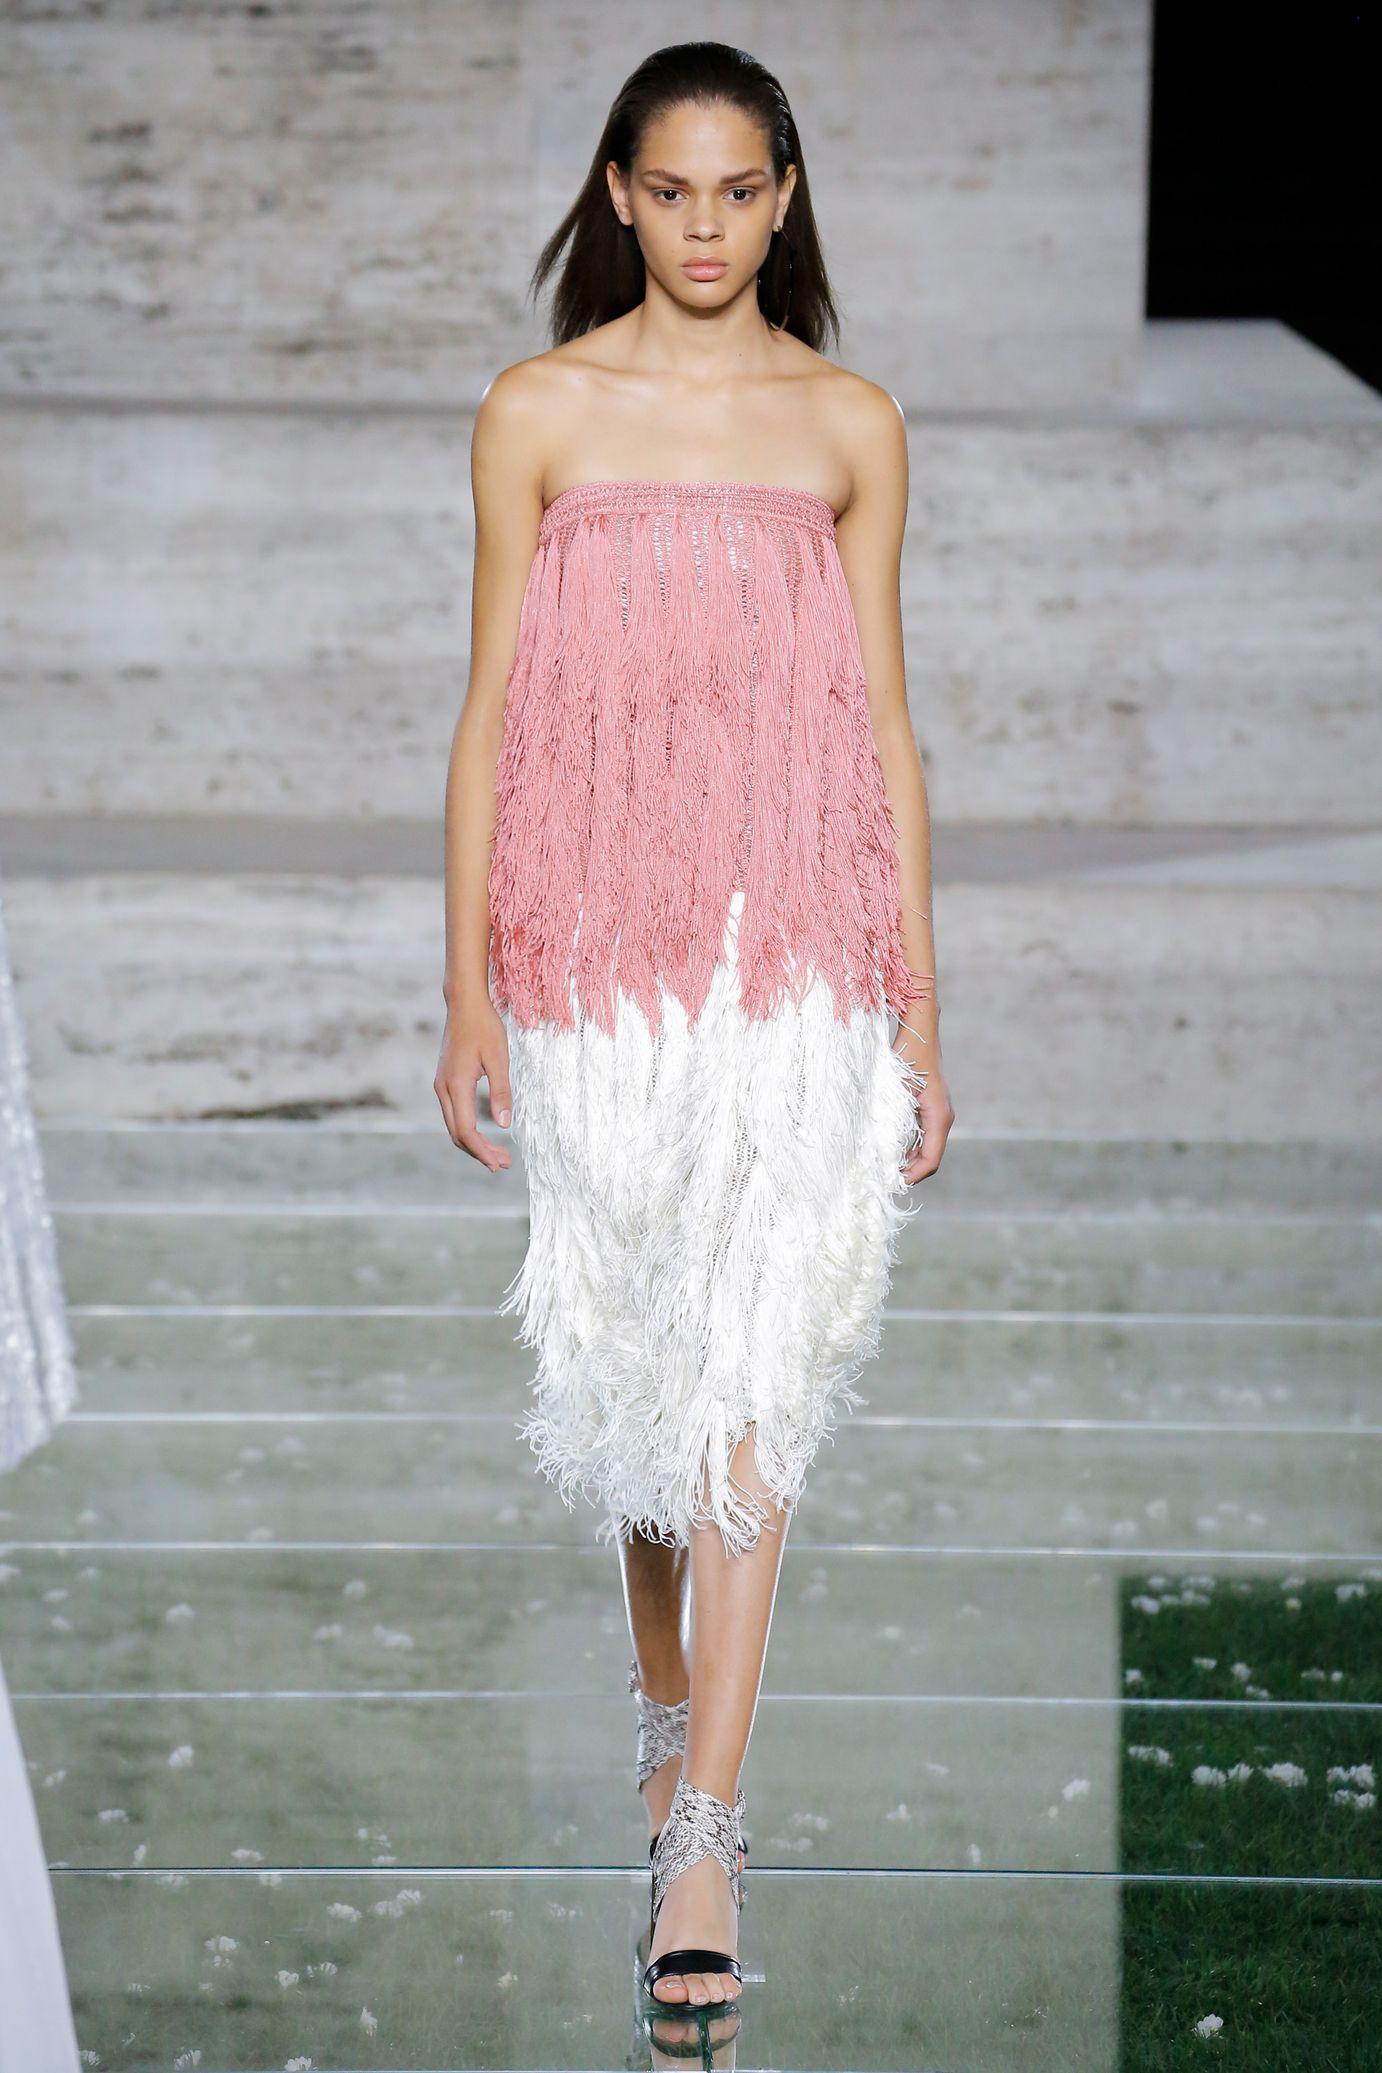 Salvatore Ferragamo весна лето 2018 платье с бахромой